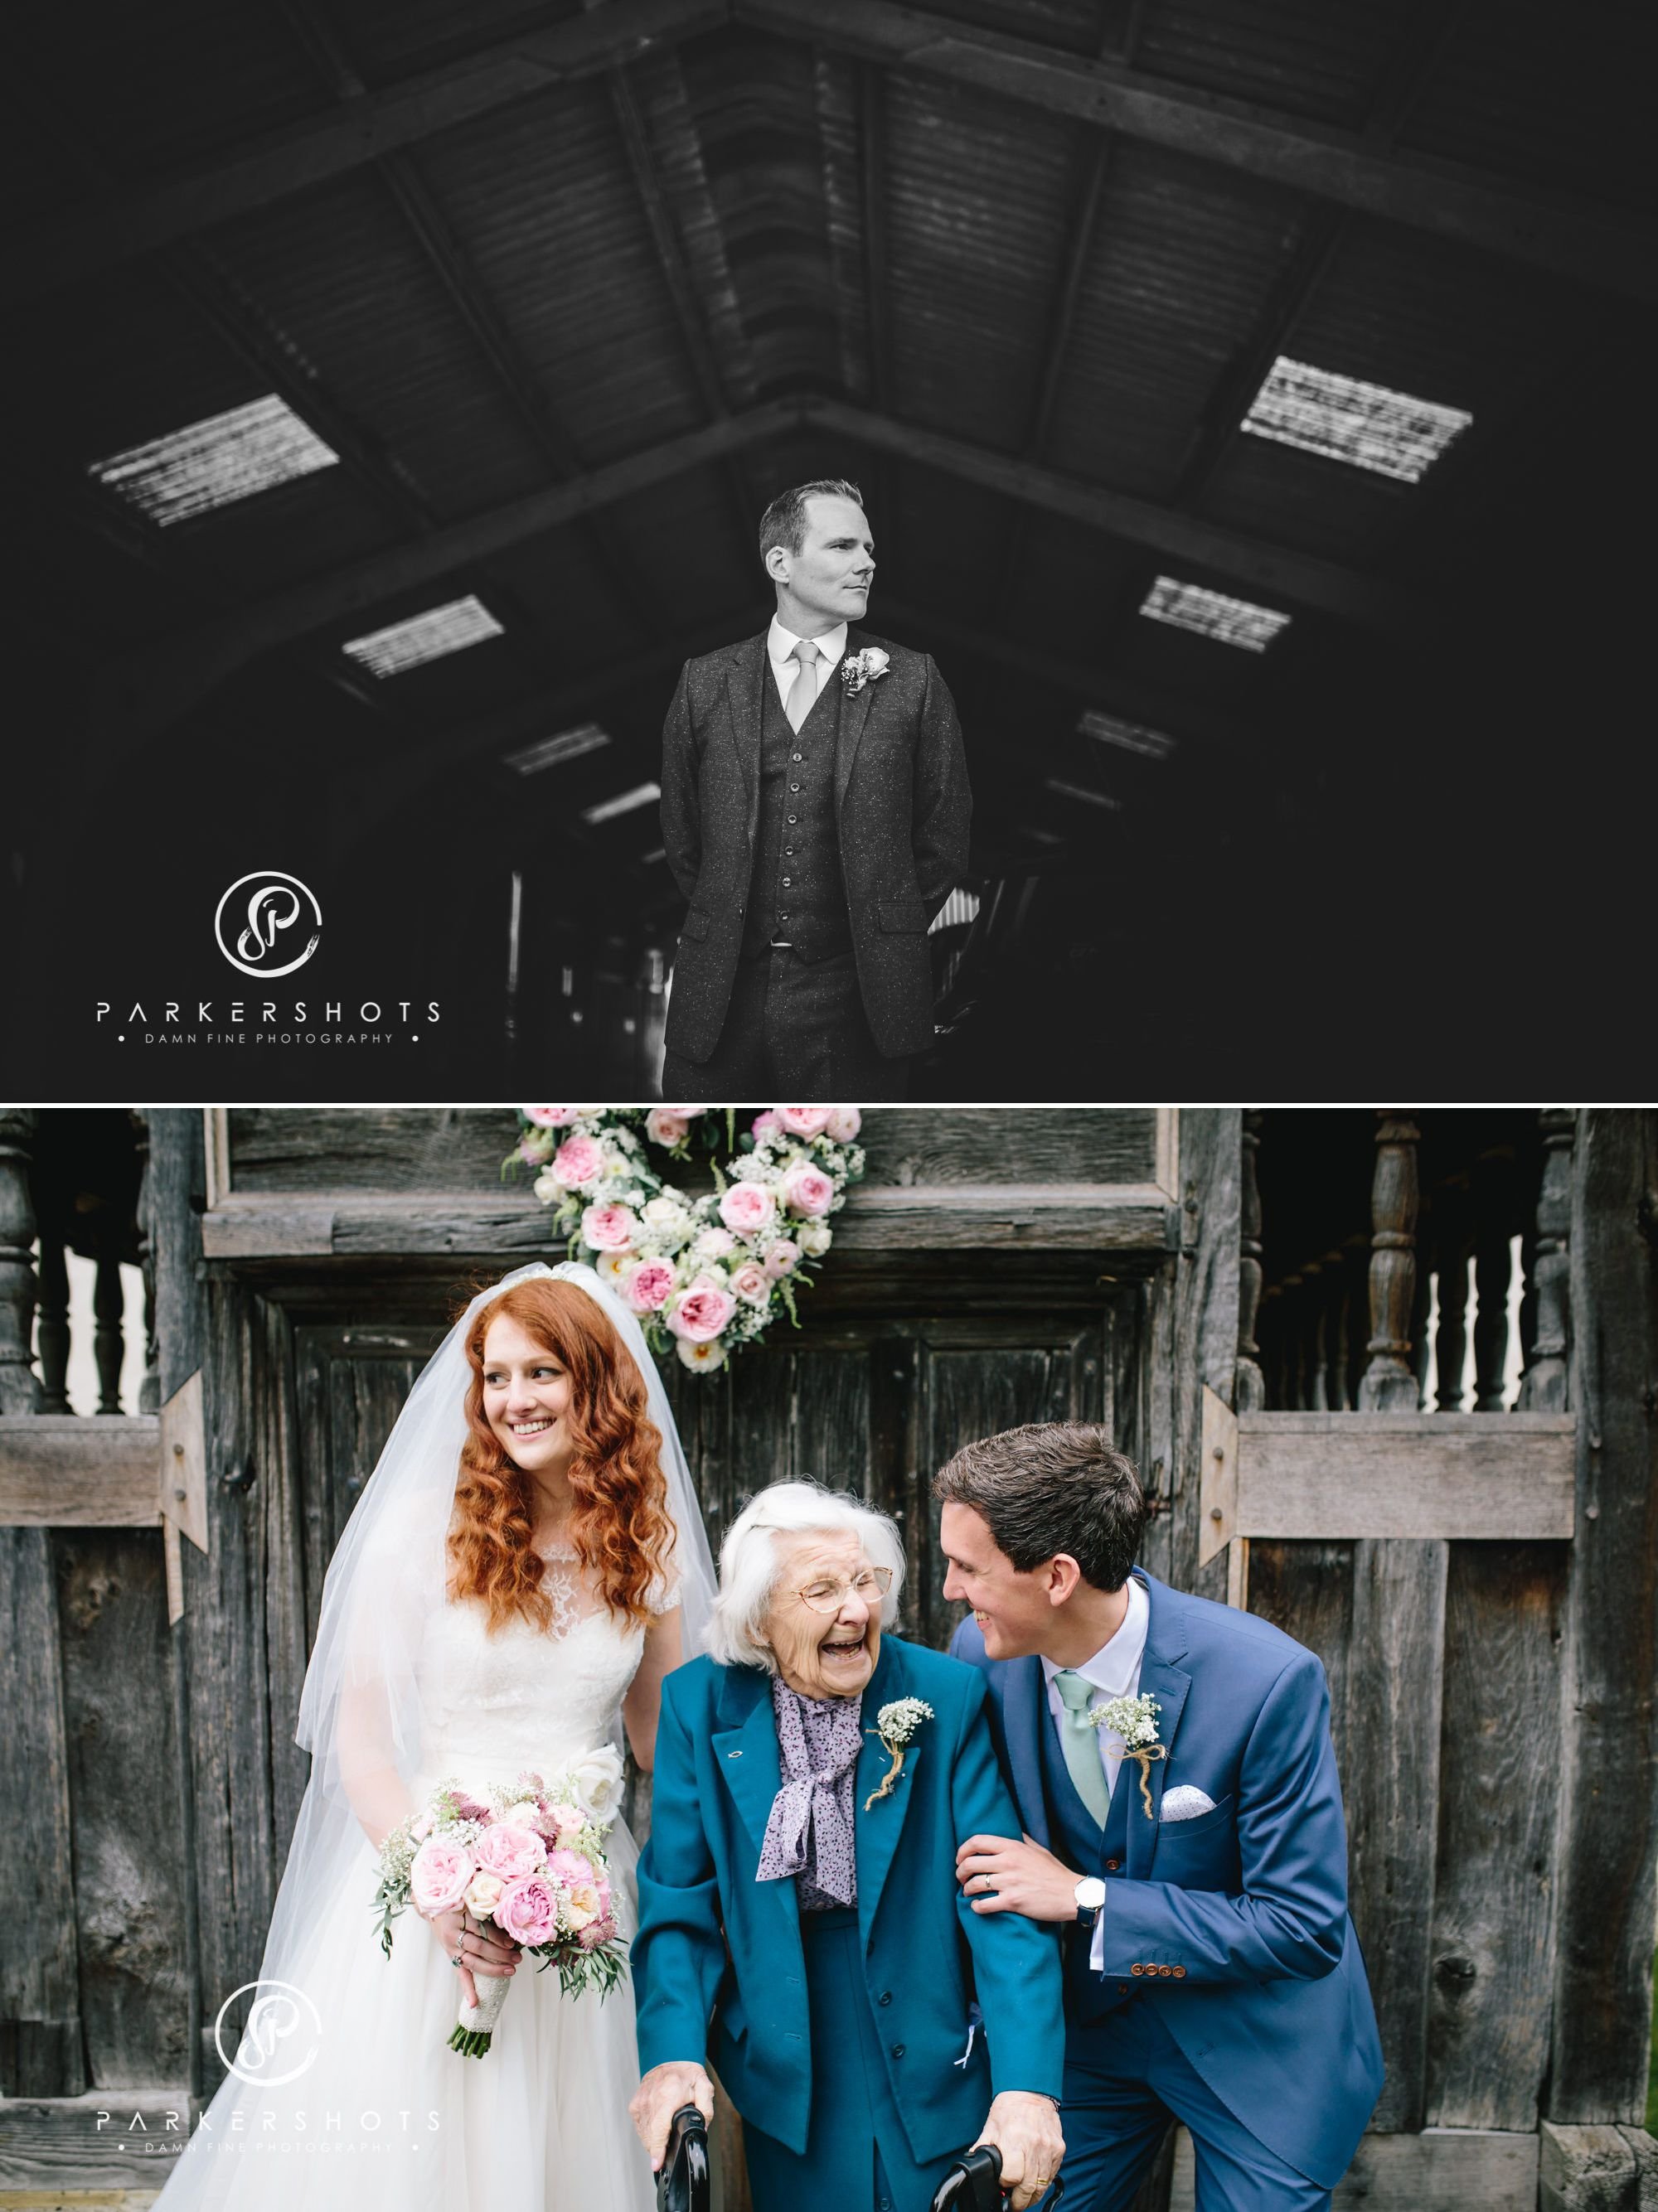 Best_Of_Wedding_Photographer_2015 8